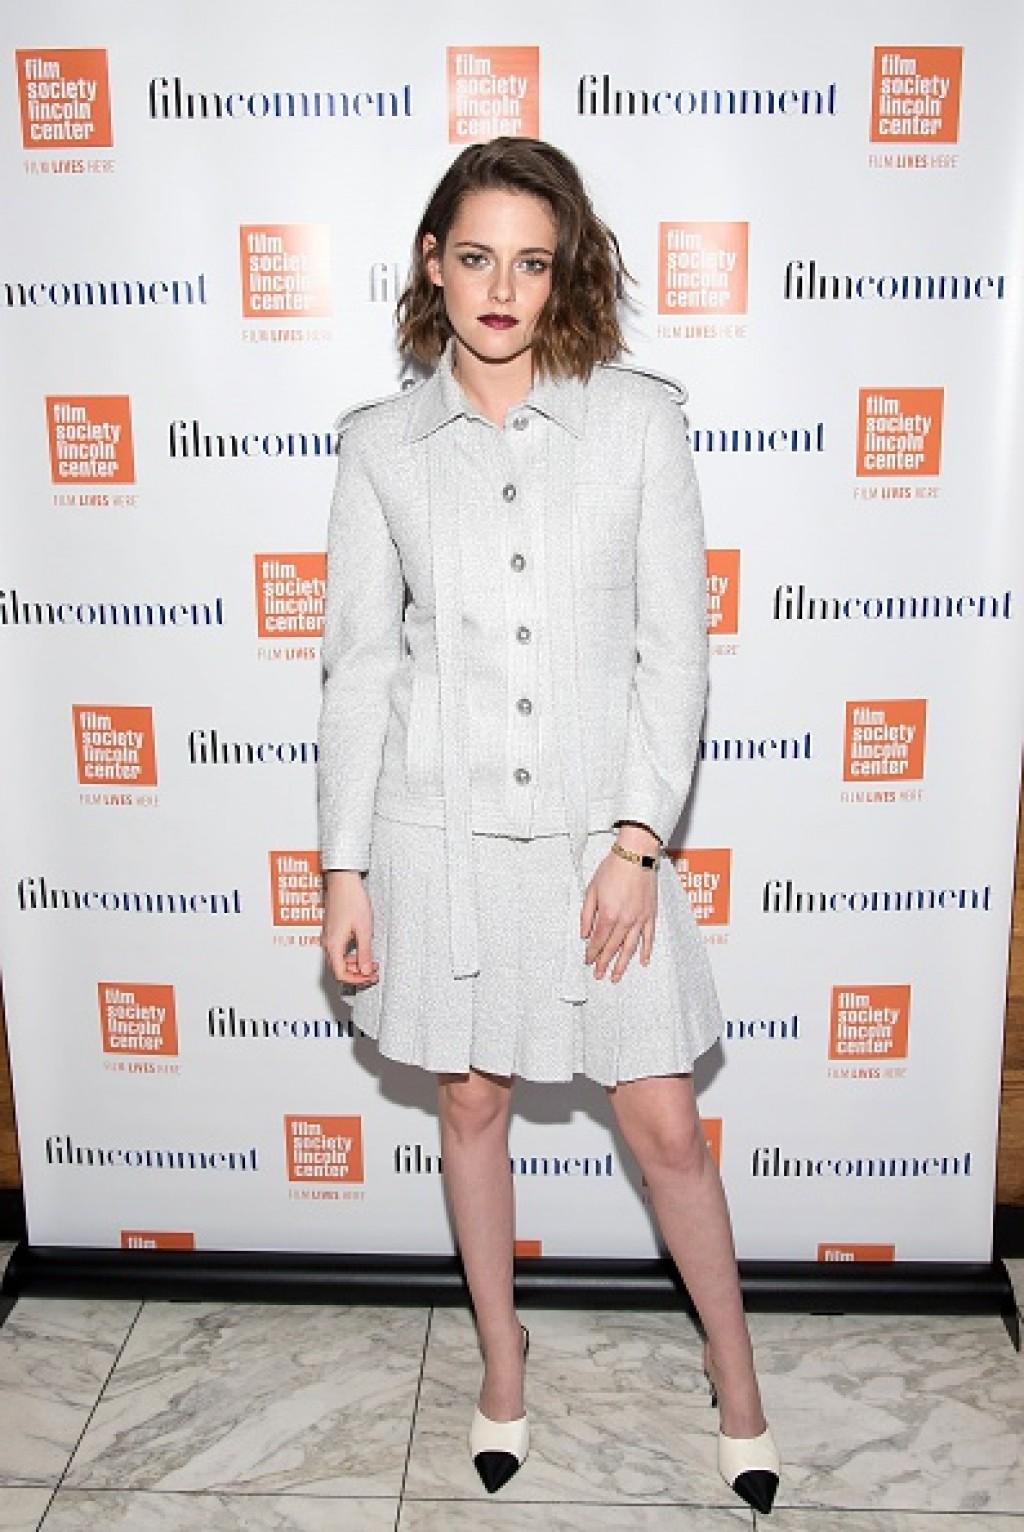 Kristen-Stewart-The-Tonight-Show-Dress-1024x1532